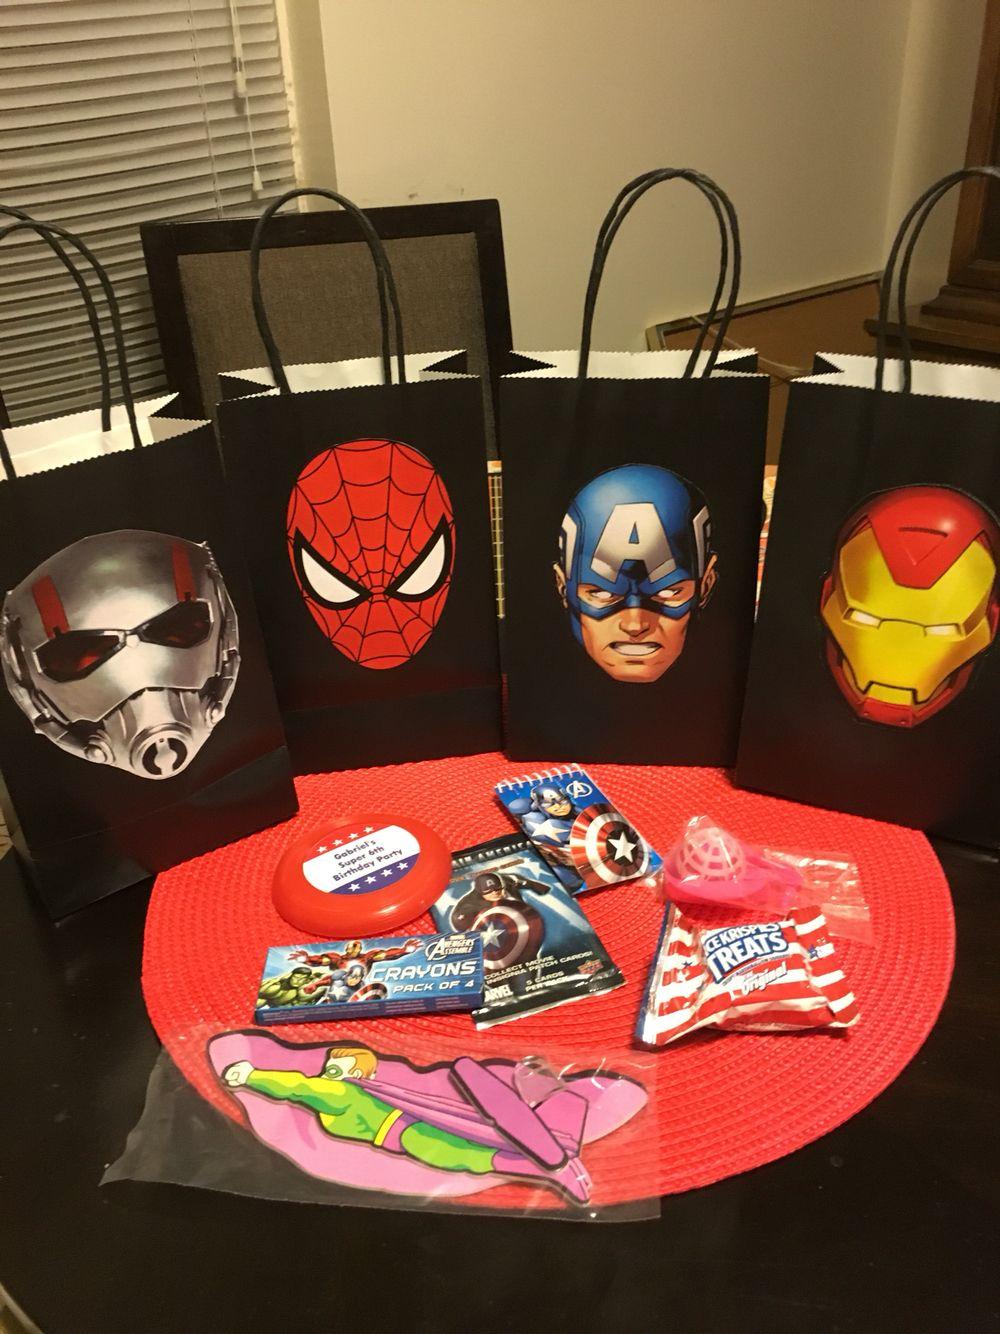 Spiderman Black Widow Personalized Avengers Felt Masks Avengers Birthday Party Favors Hulk! Ironman Thor Hawkeye Captain America